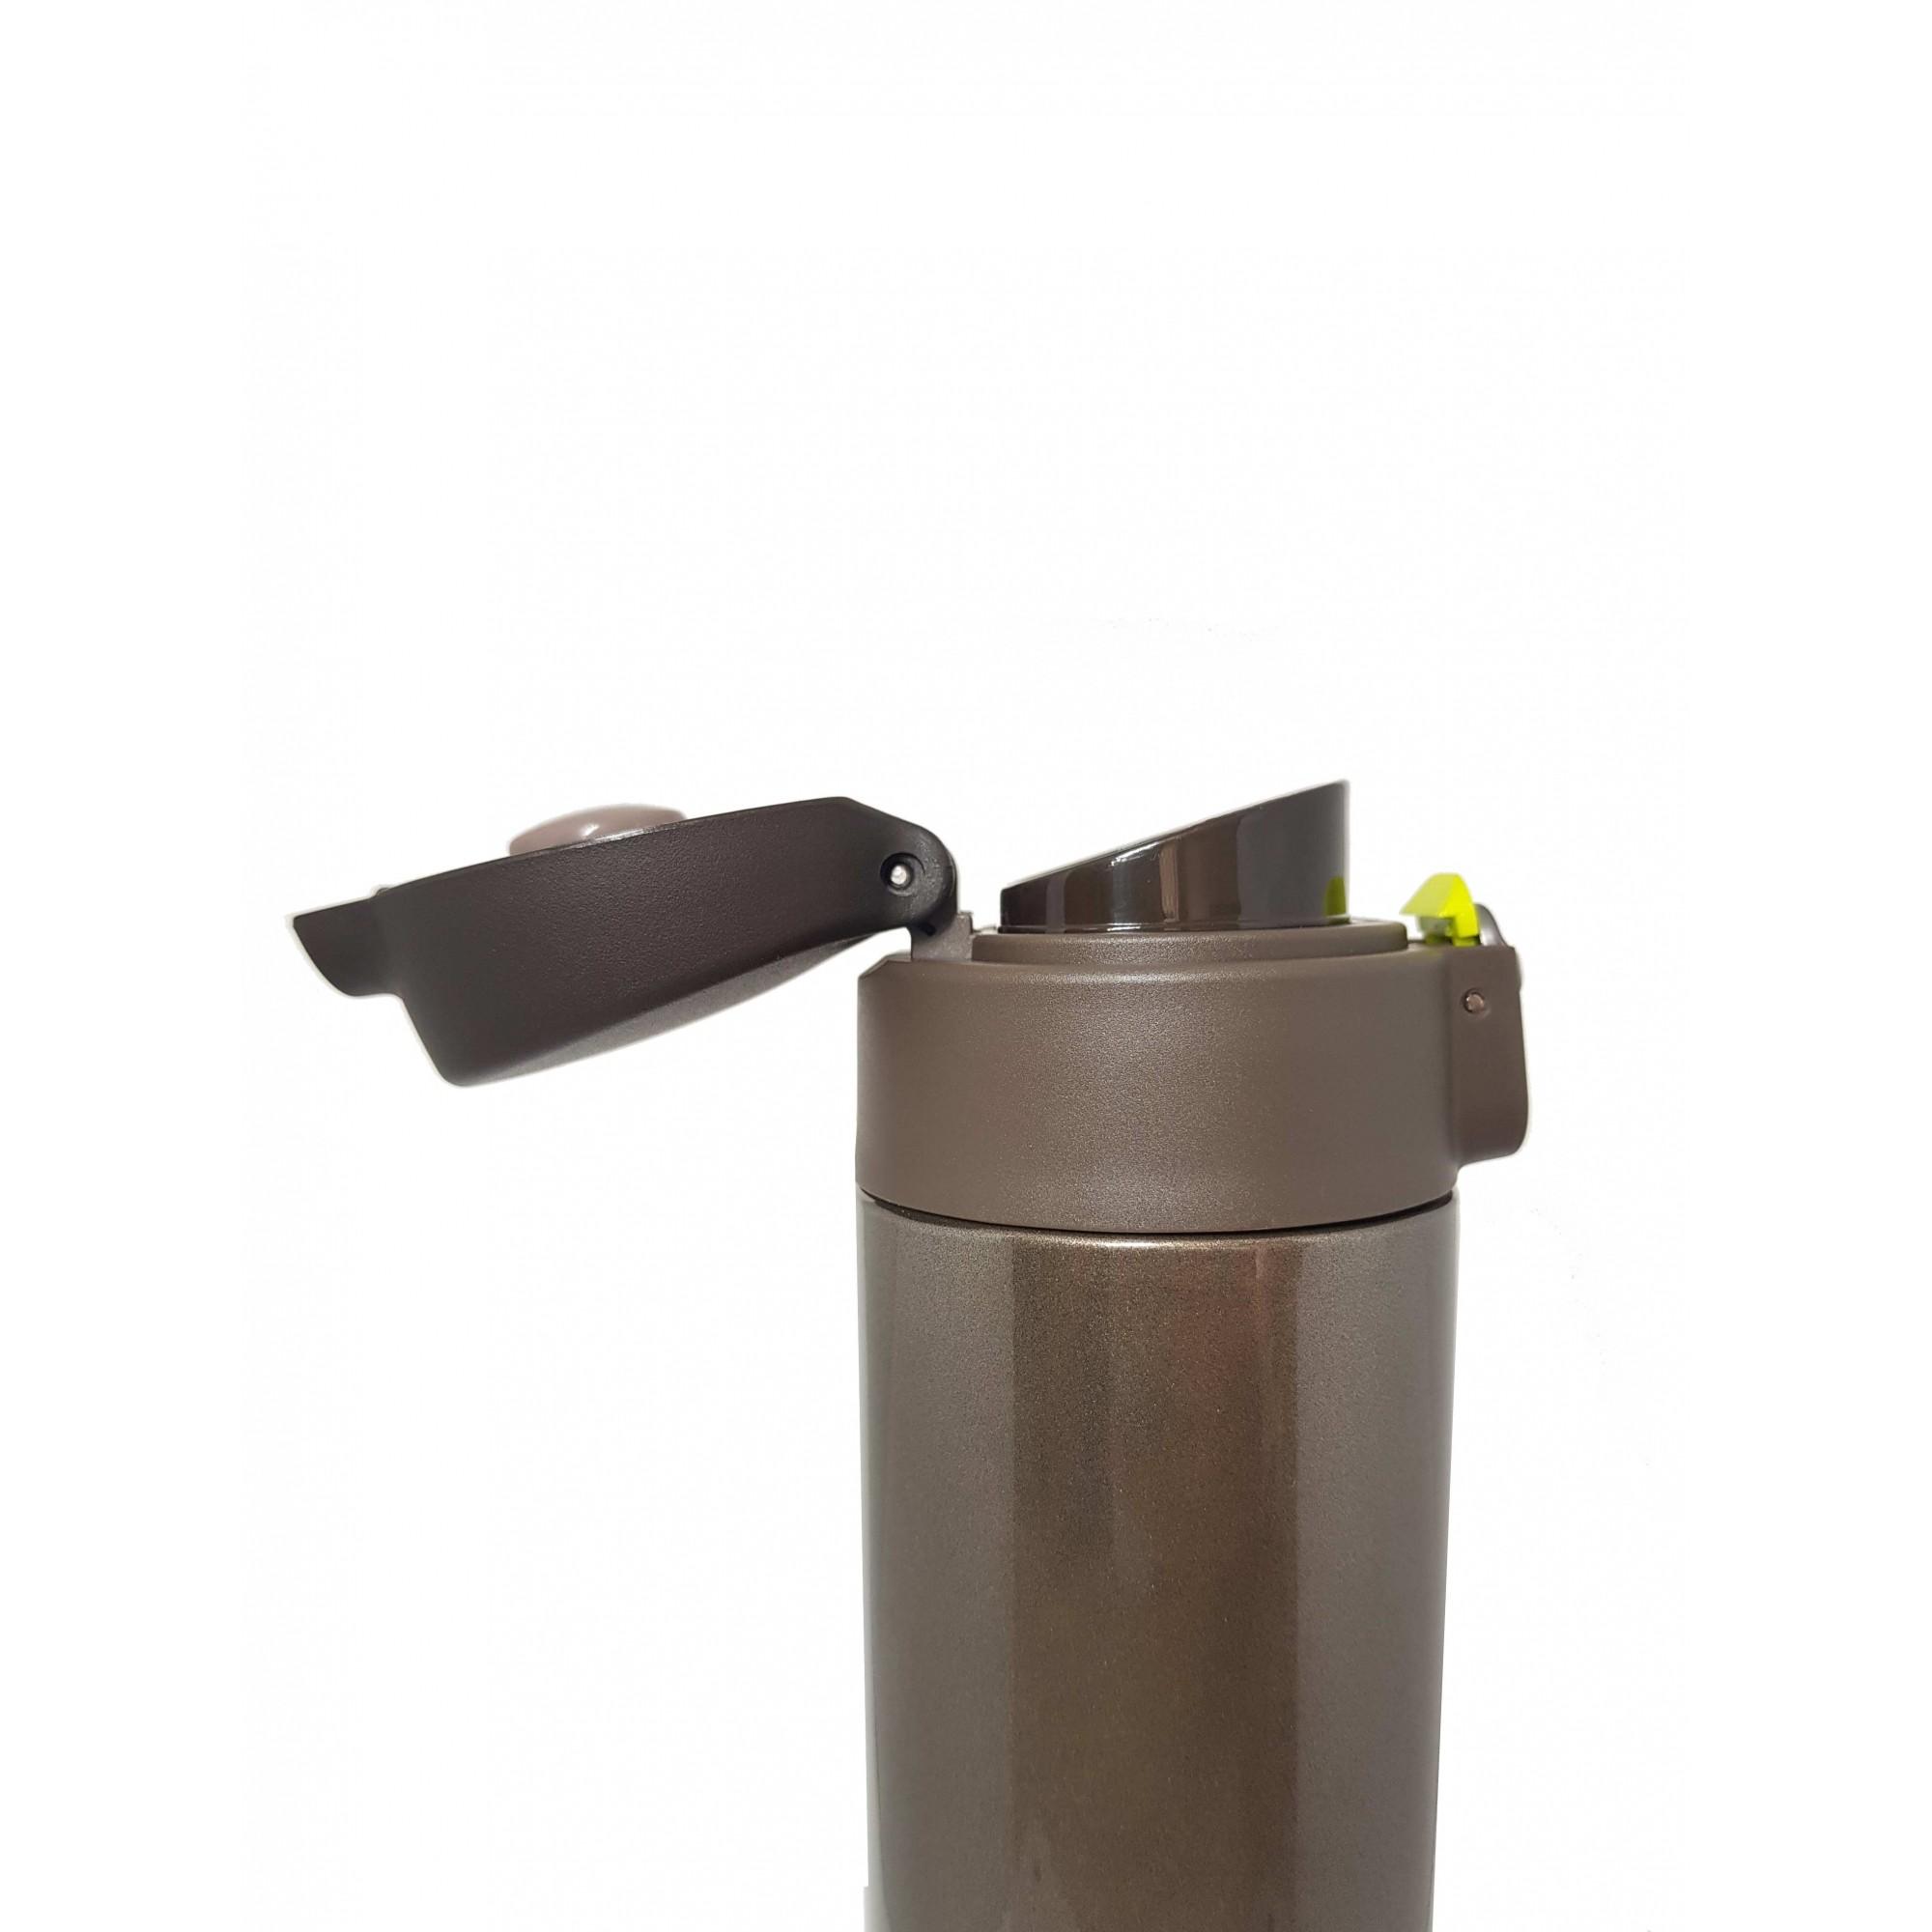 Kit Mundo Mochila + garrafa inox 500 ml Marrom + kit 6 em 1 Rose Gold